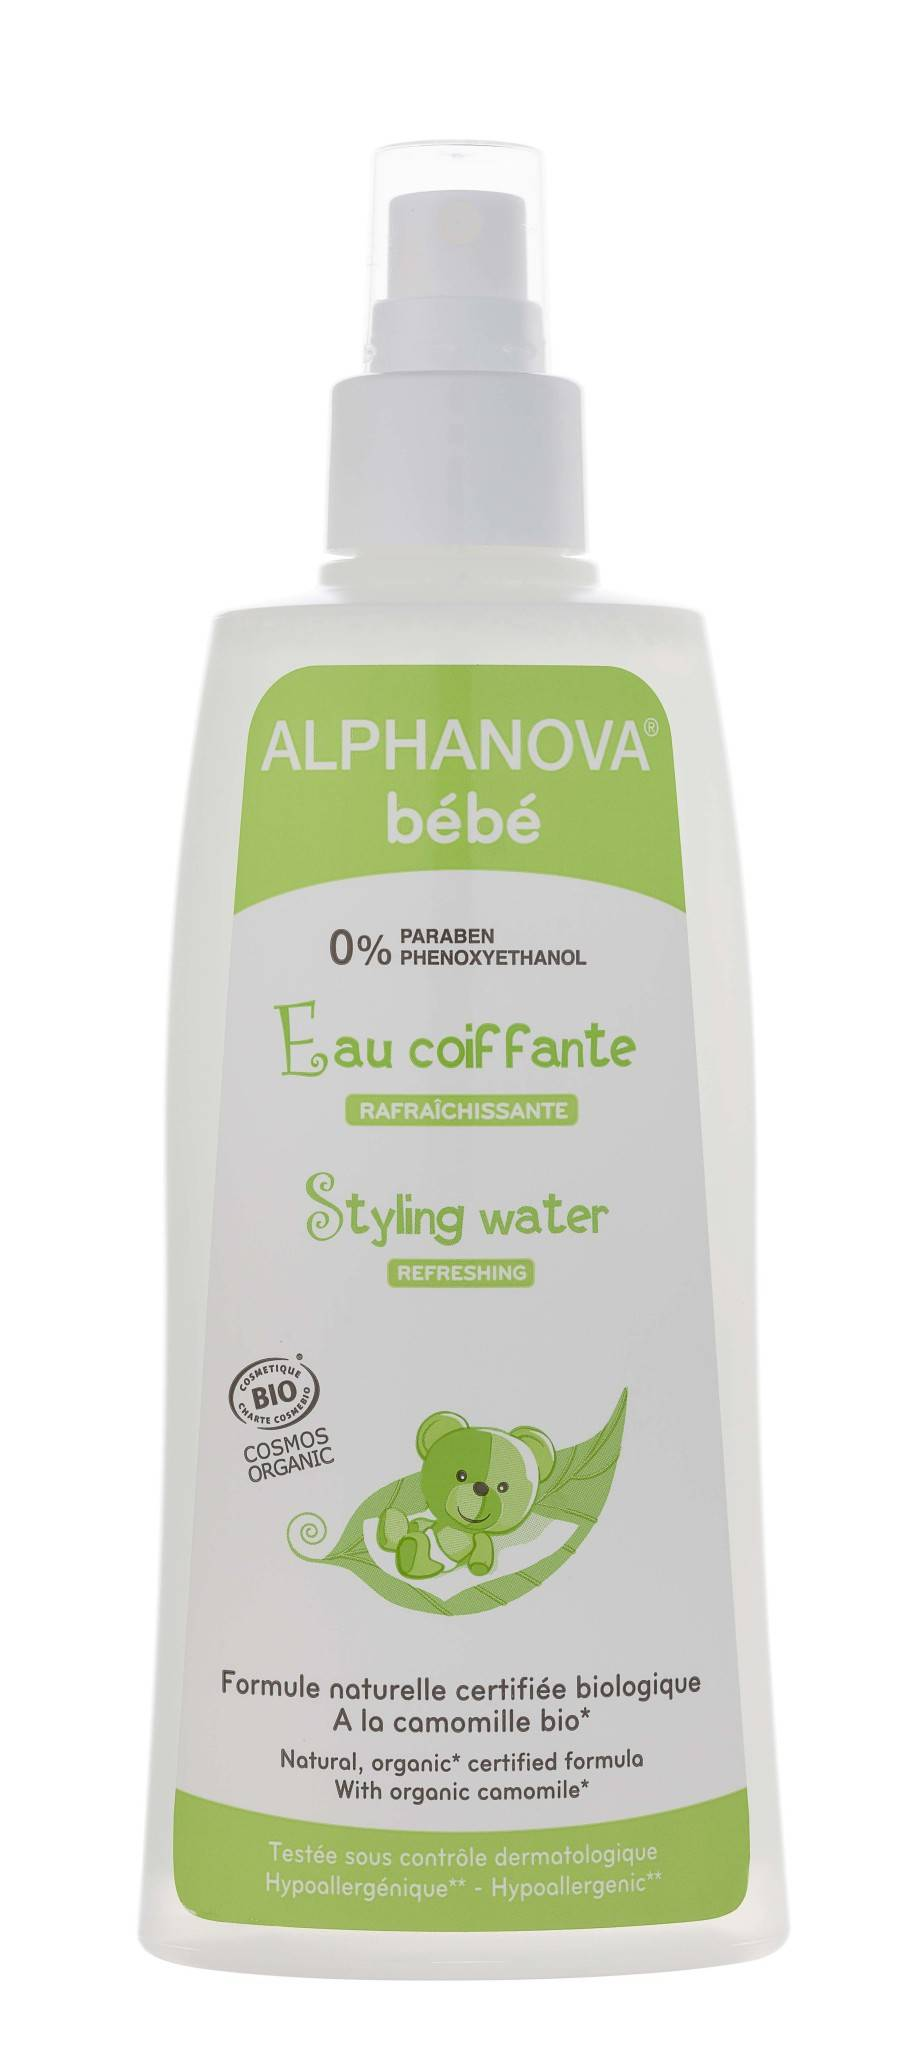 Alphanova bebe eau coiffante 200ml